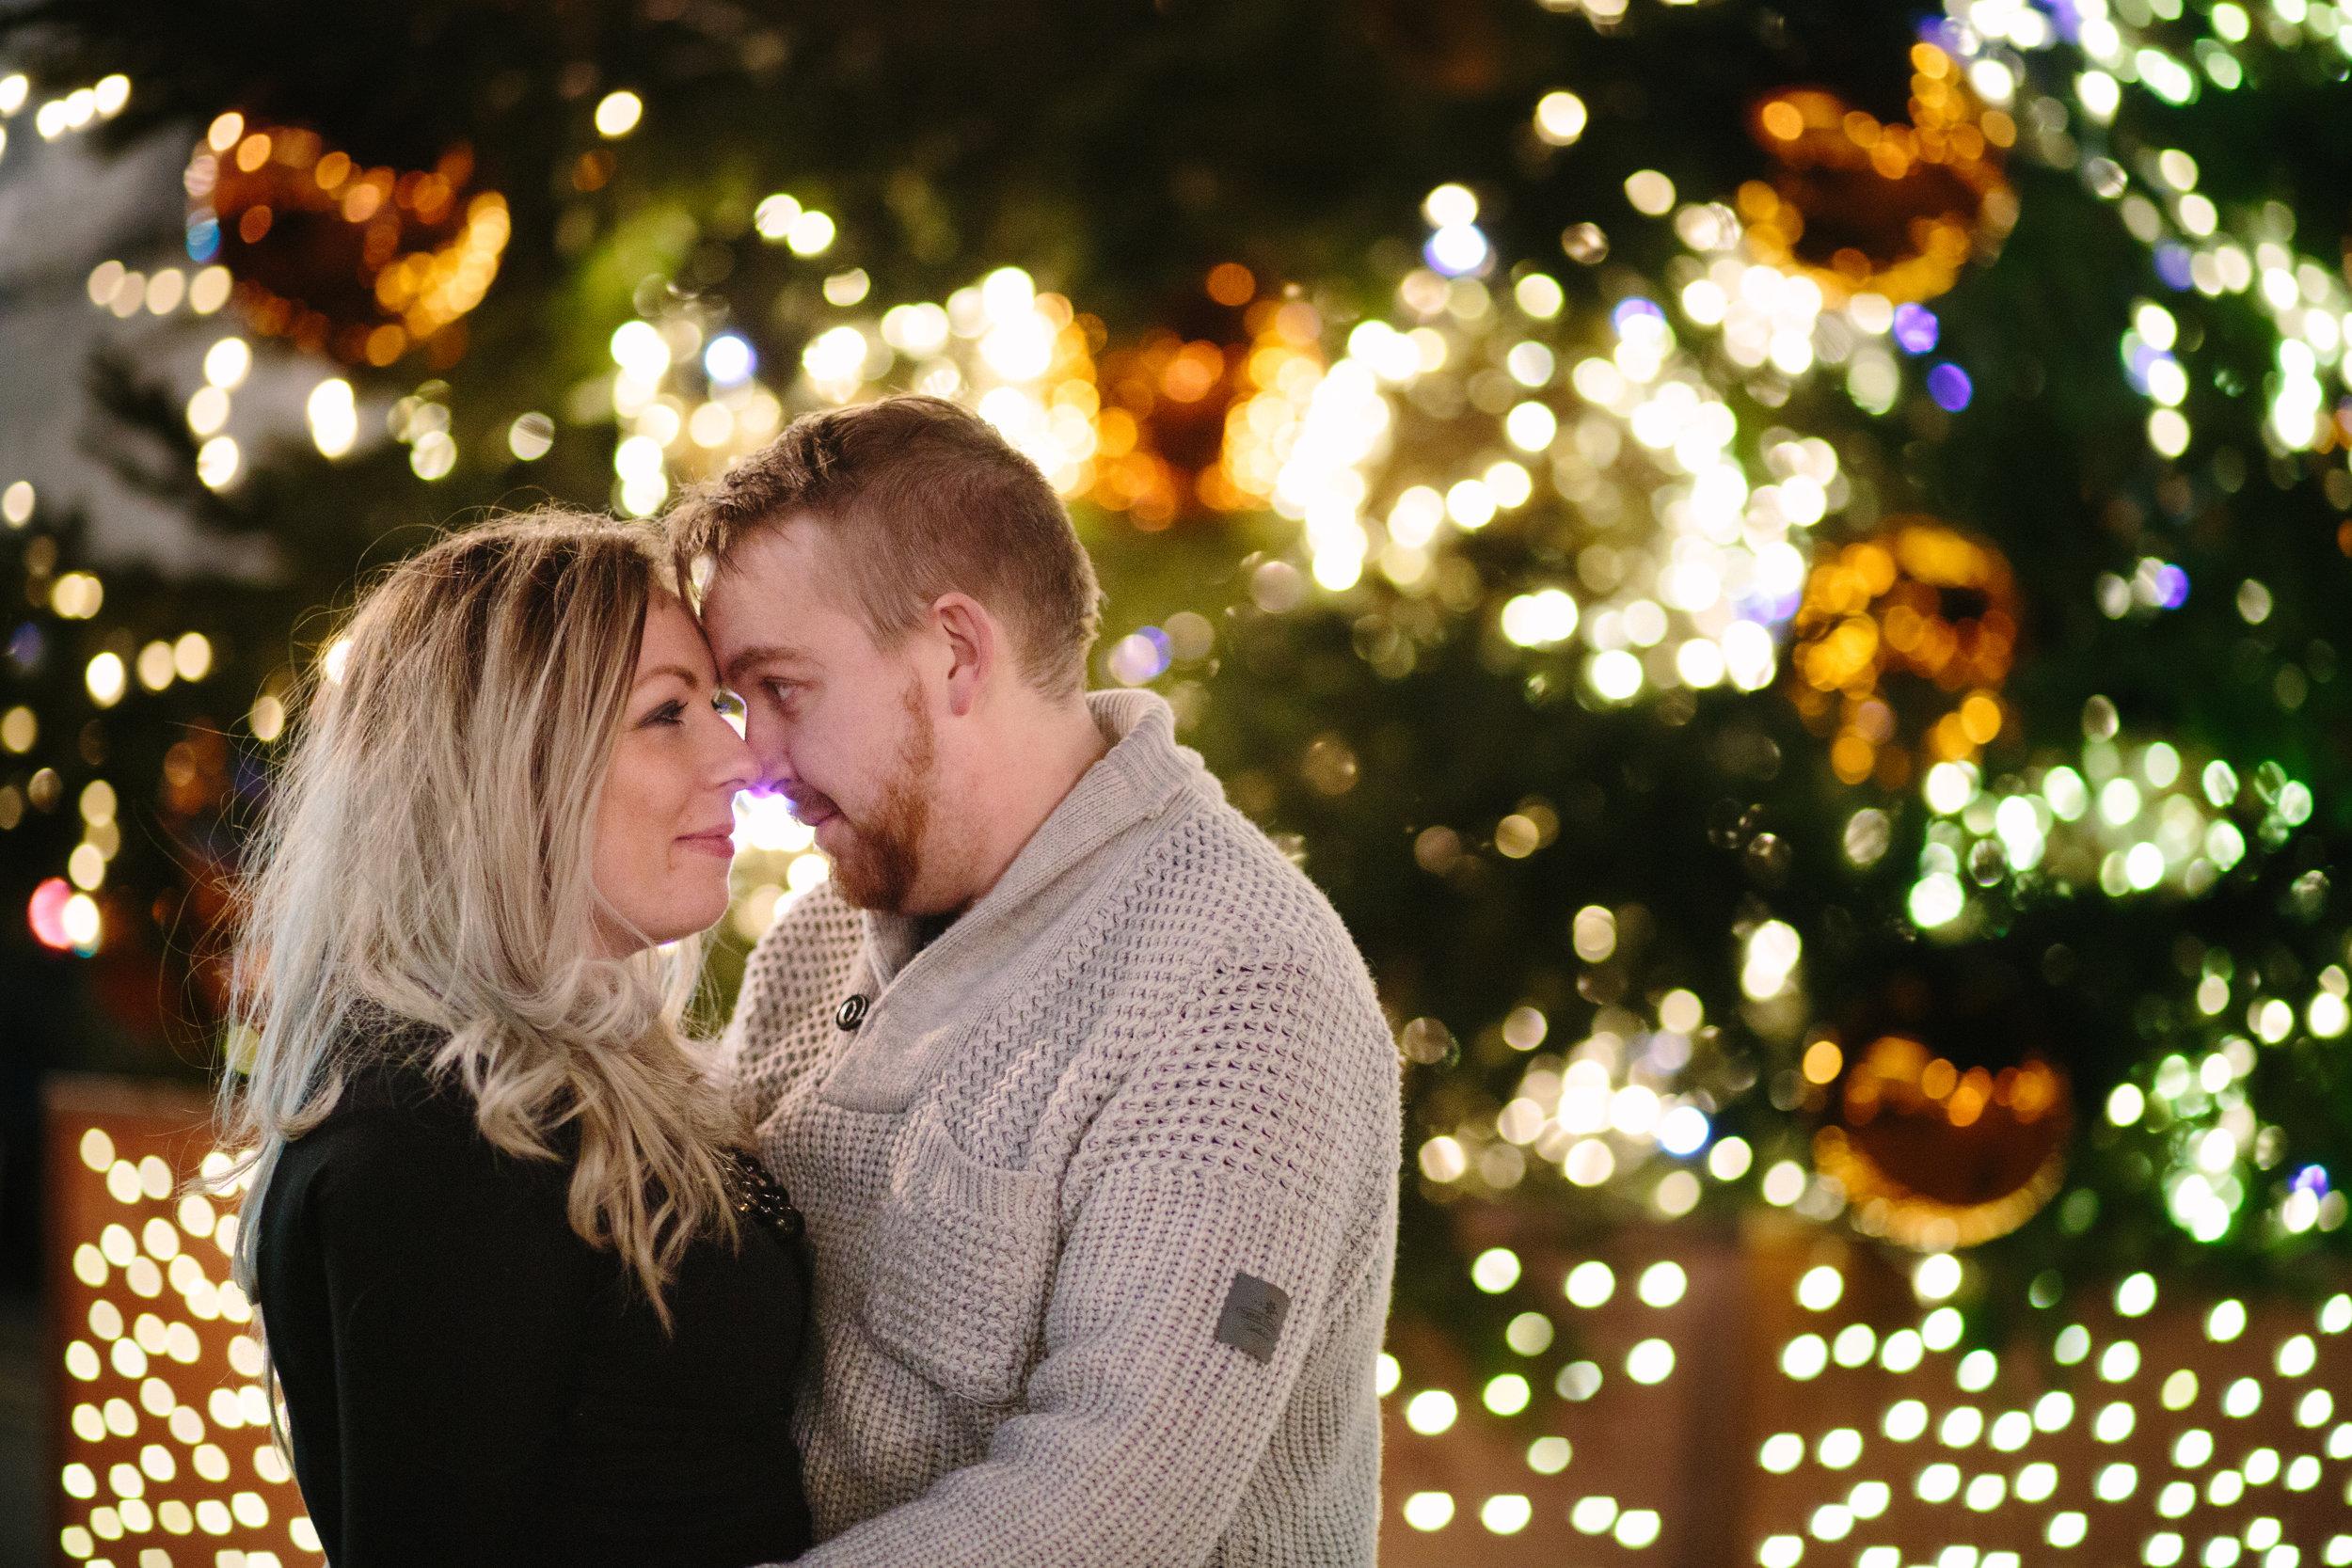 london-oxford-street-christmas-lights-engagement-wedding-photography-16